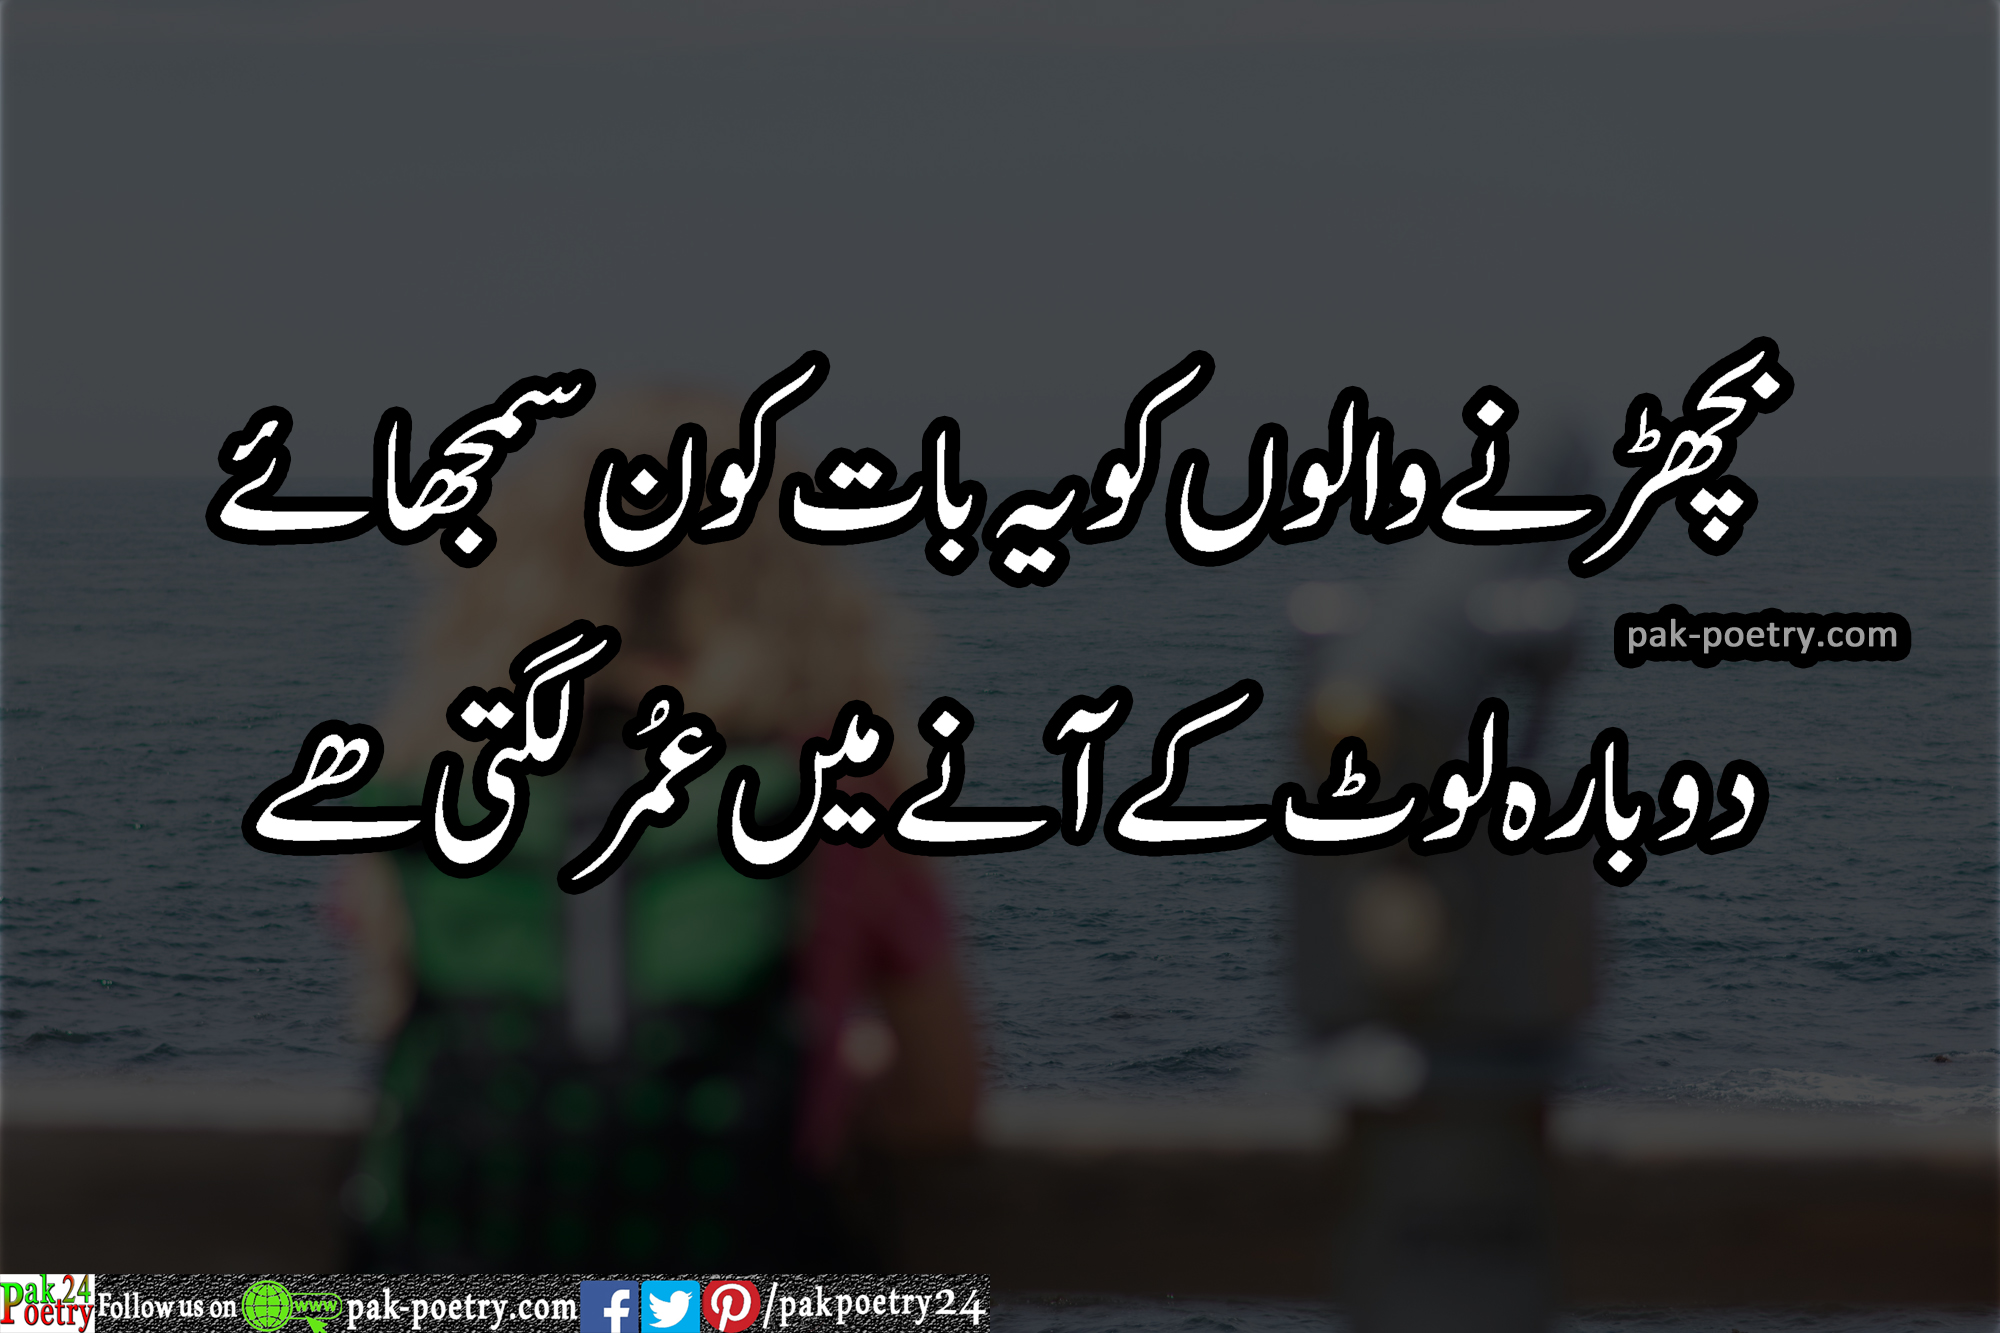 sad poetry, sad poetry in urdu, poetry sad, urdu sad poetry, urdu poetry sad, poetry in urdu sad, sad poetry urdu, poetry urdu sad, yaad poetry, yaad poetry in urdu, urdu shayari sad, sad urdu poetry yaad, poetry poetry, sed poetry, urdu sad poetry pics, poetry in urdu, sad sad poetry,